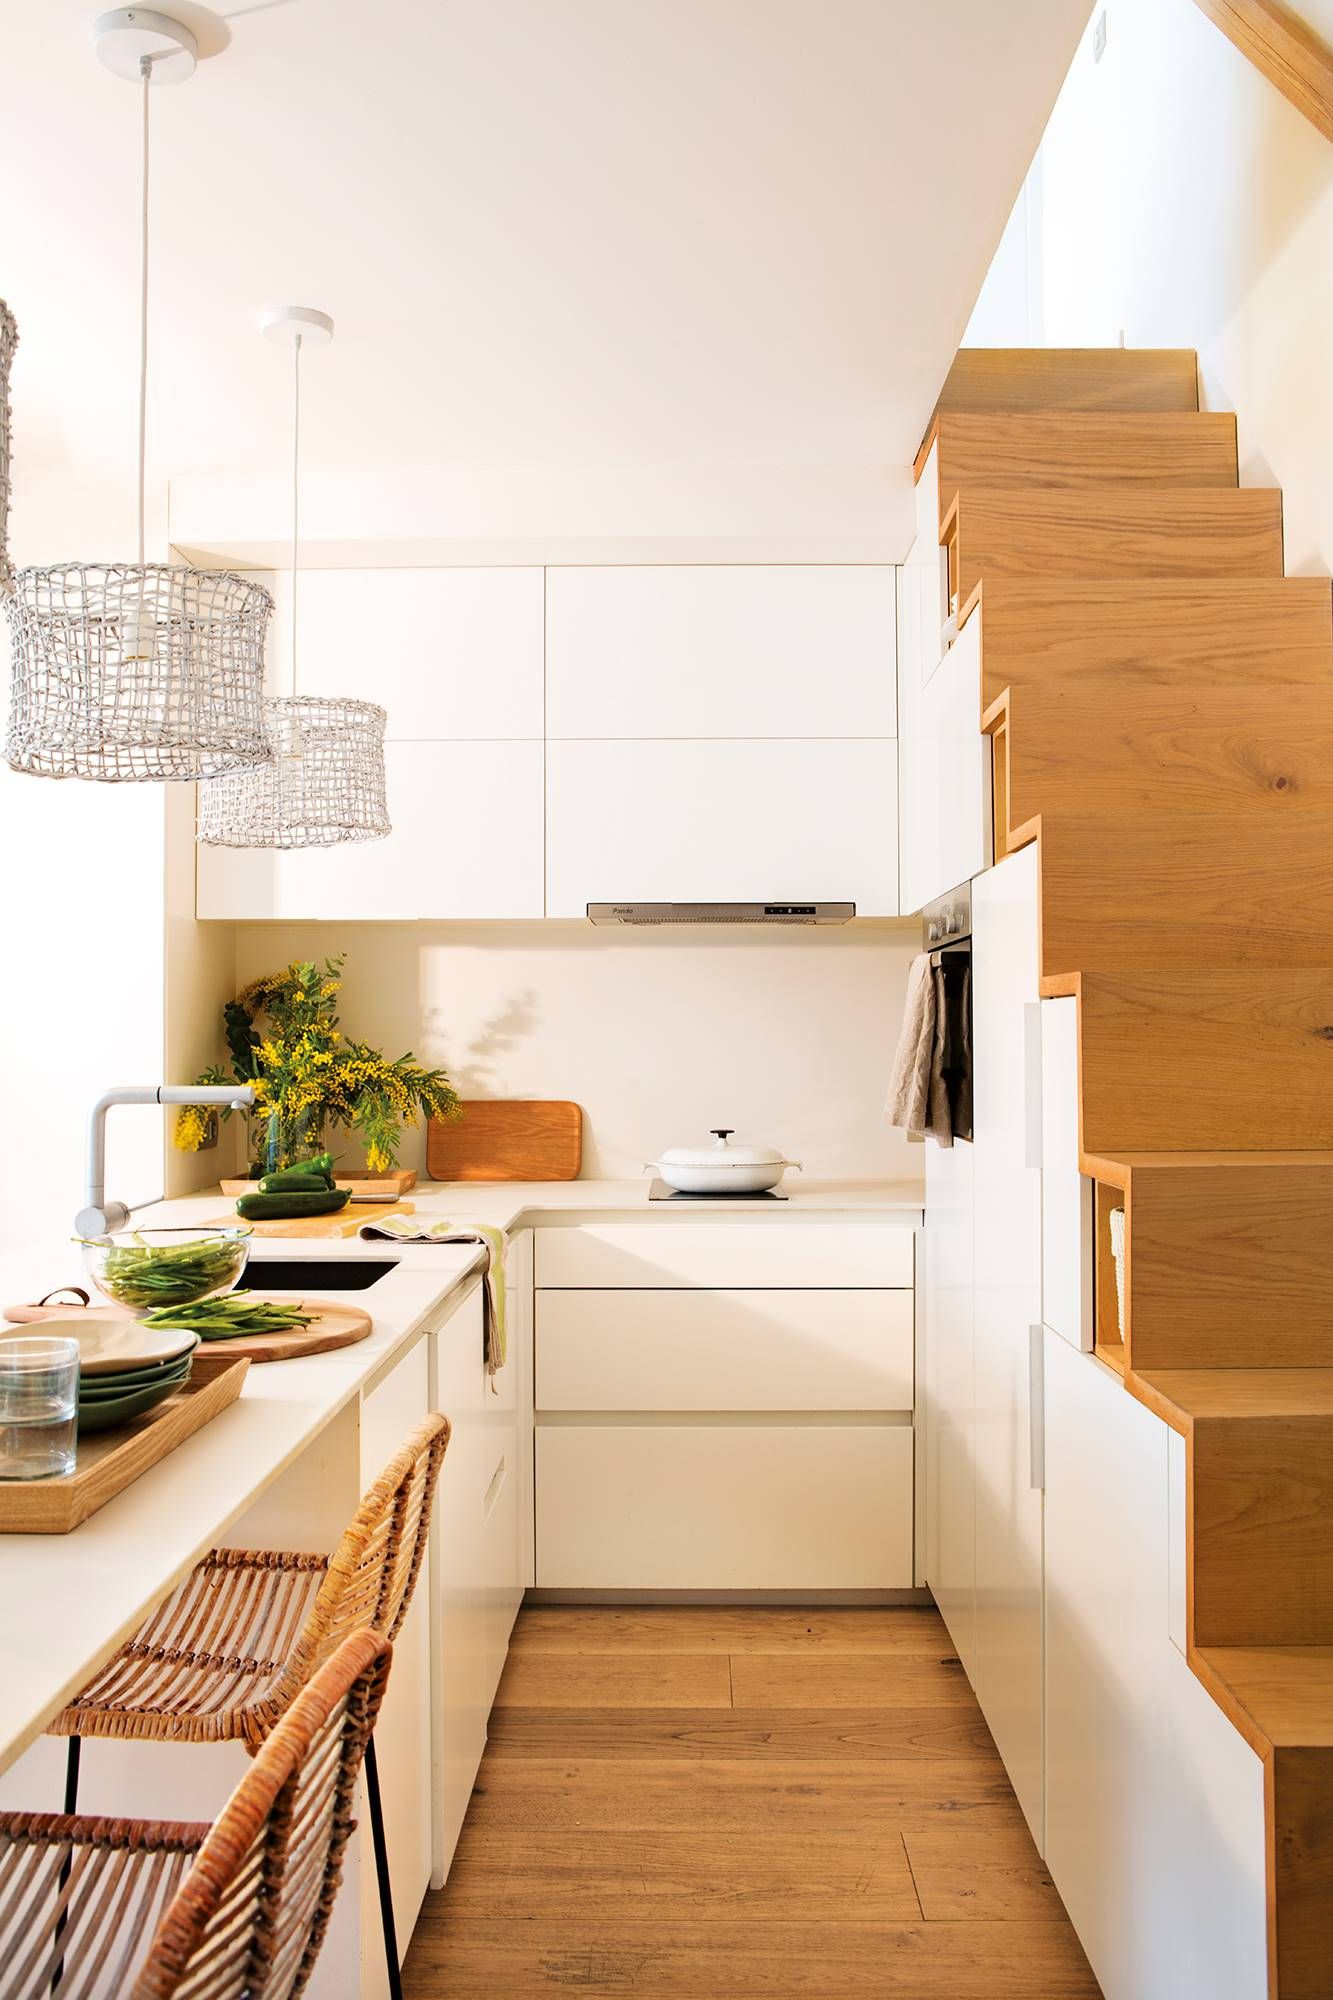 00480643. Cocina Blanca Con Escalera Con Espacio Para Guardar 00480643